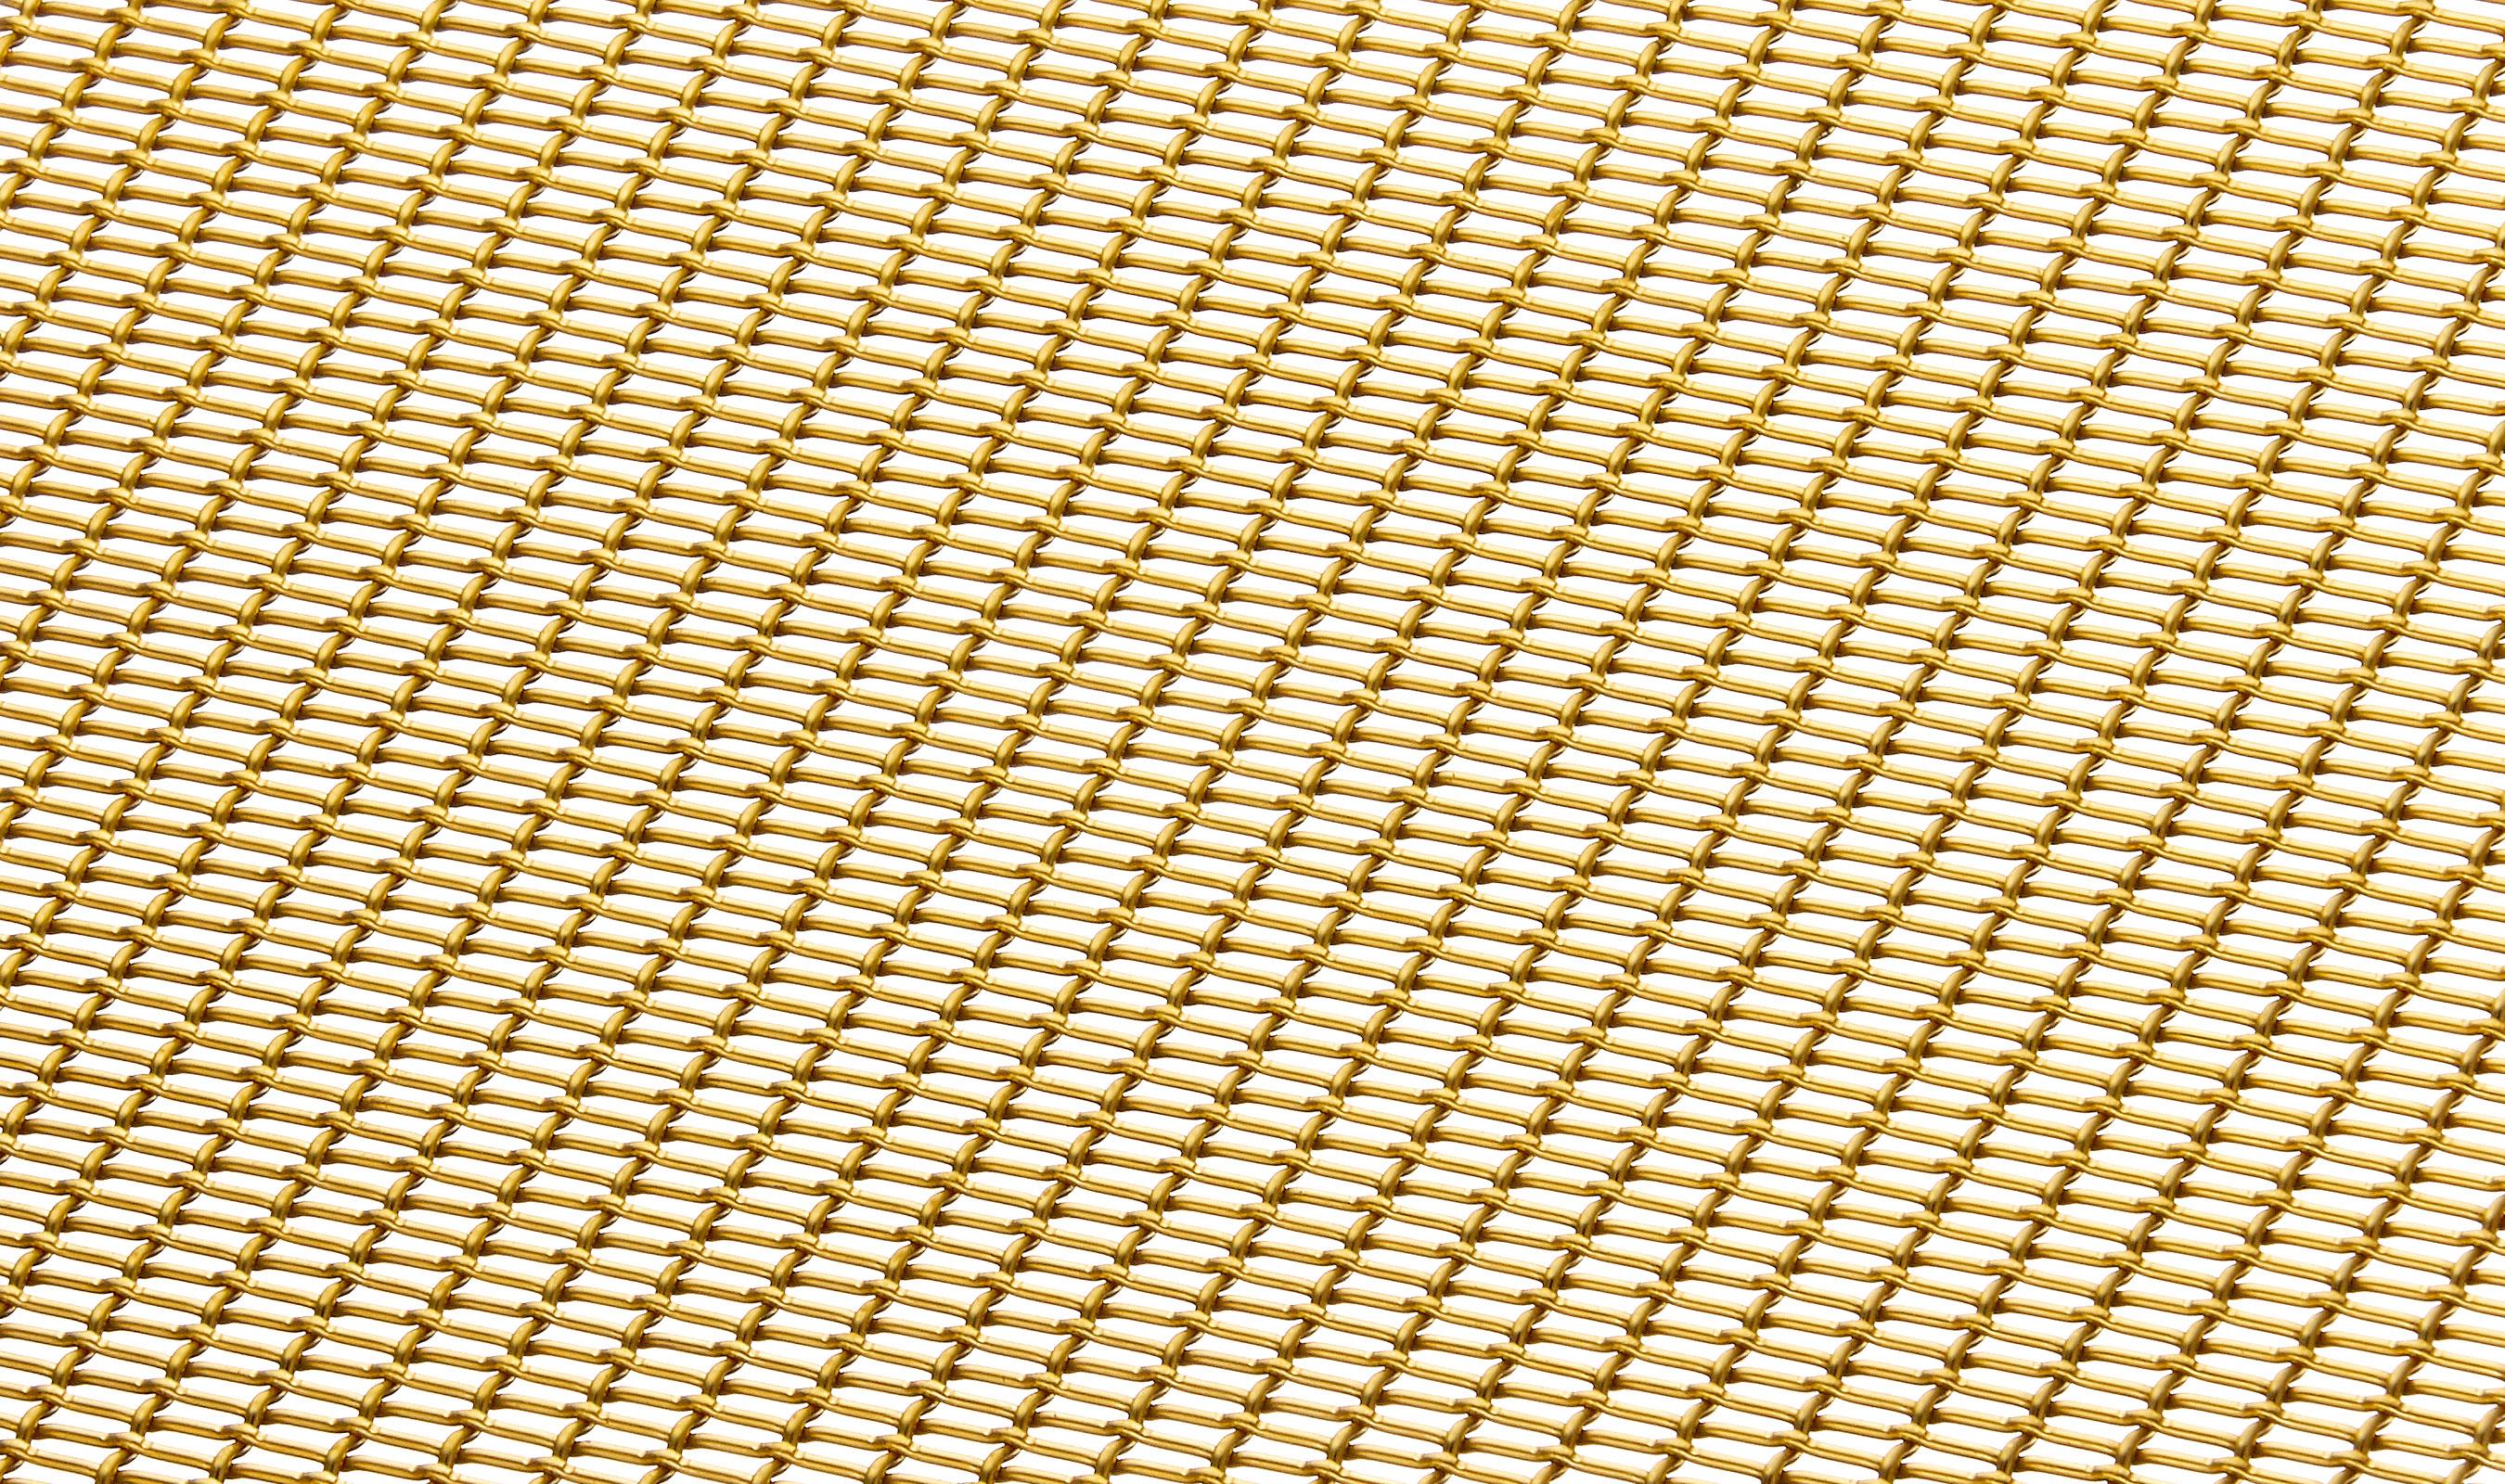 Banker Wire's LPZ-71 decorative woven wire mesh in brass